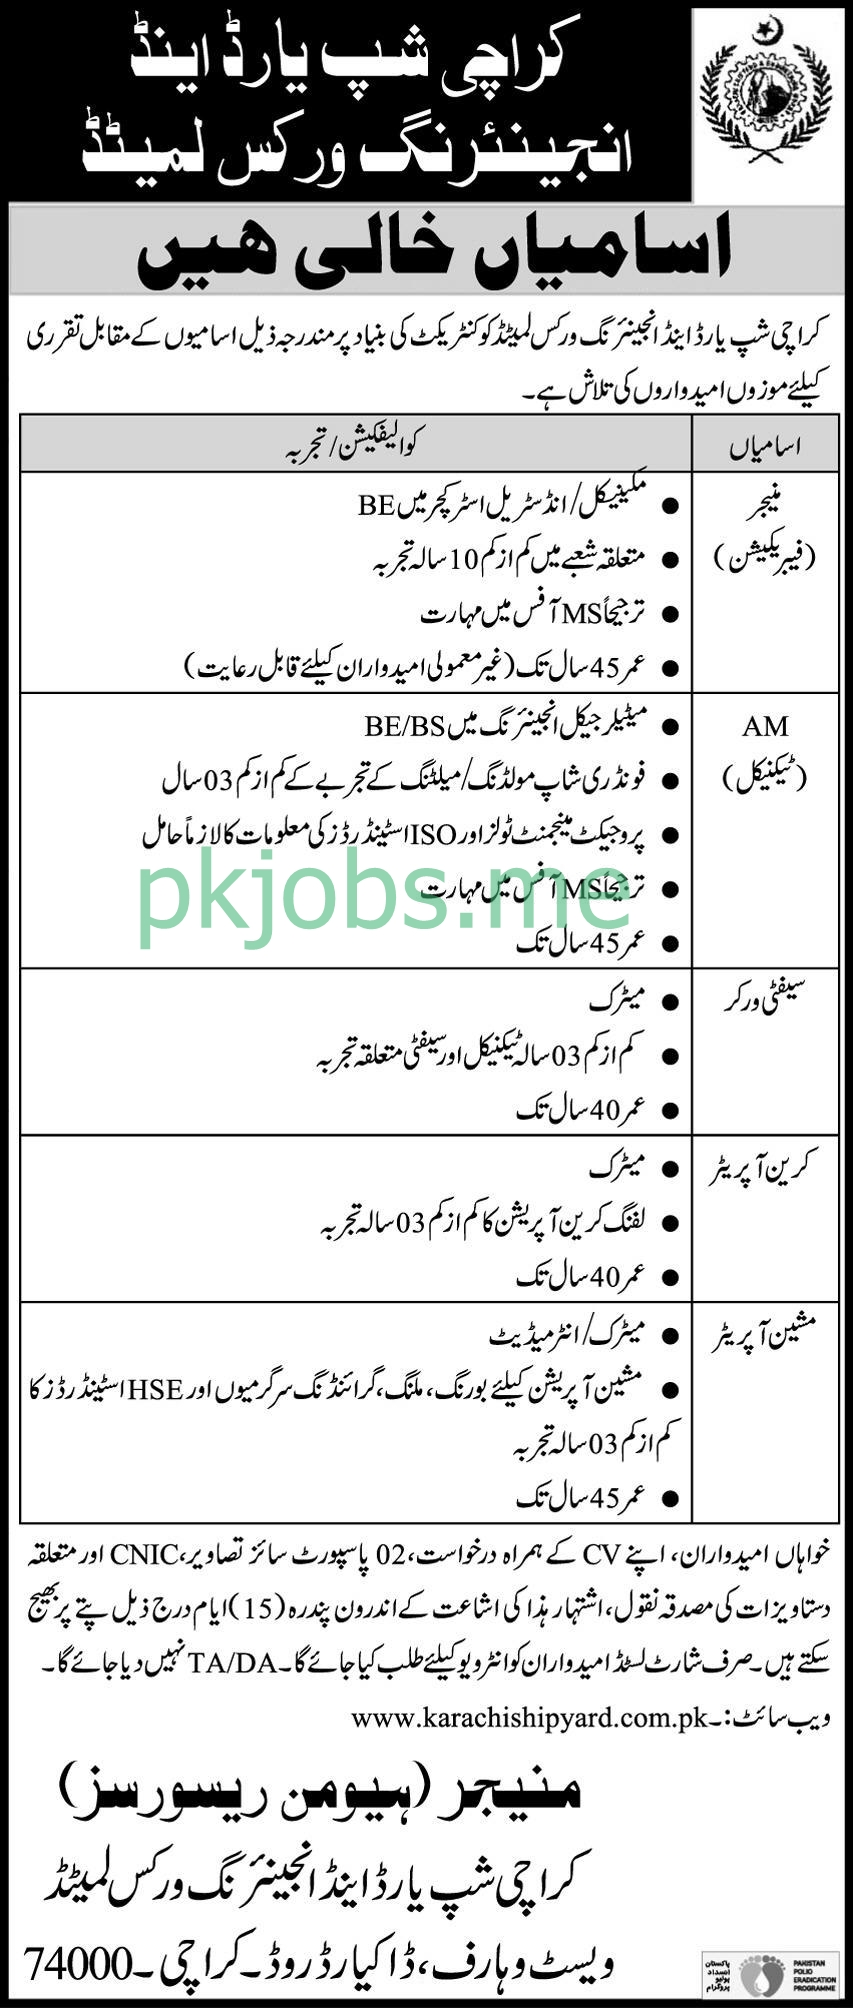 Latest Karachi Shipyard and Engineering Works Limited Posts 2021